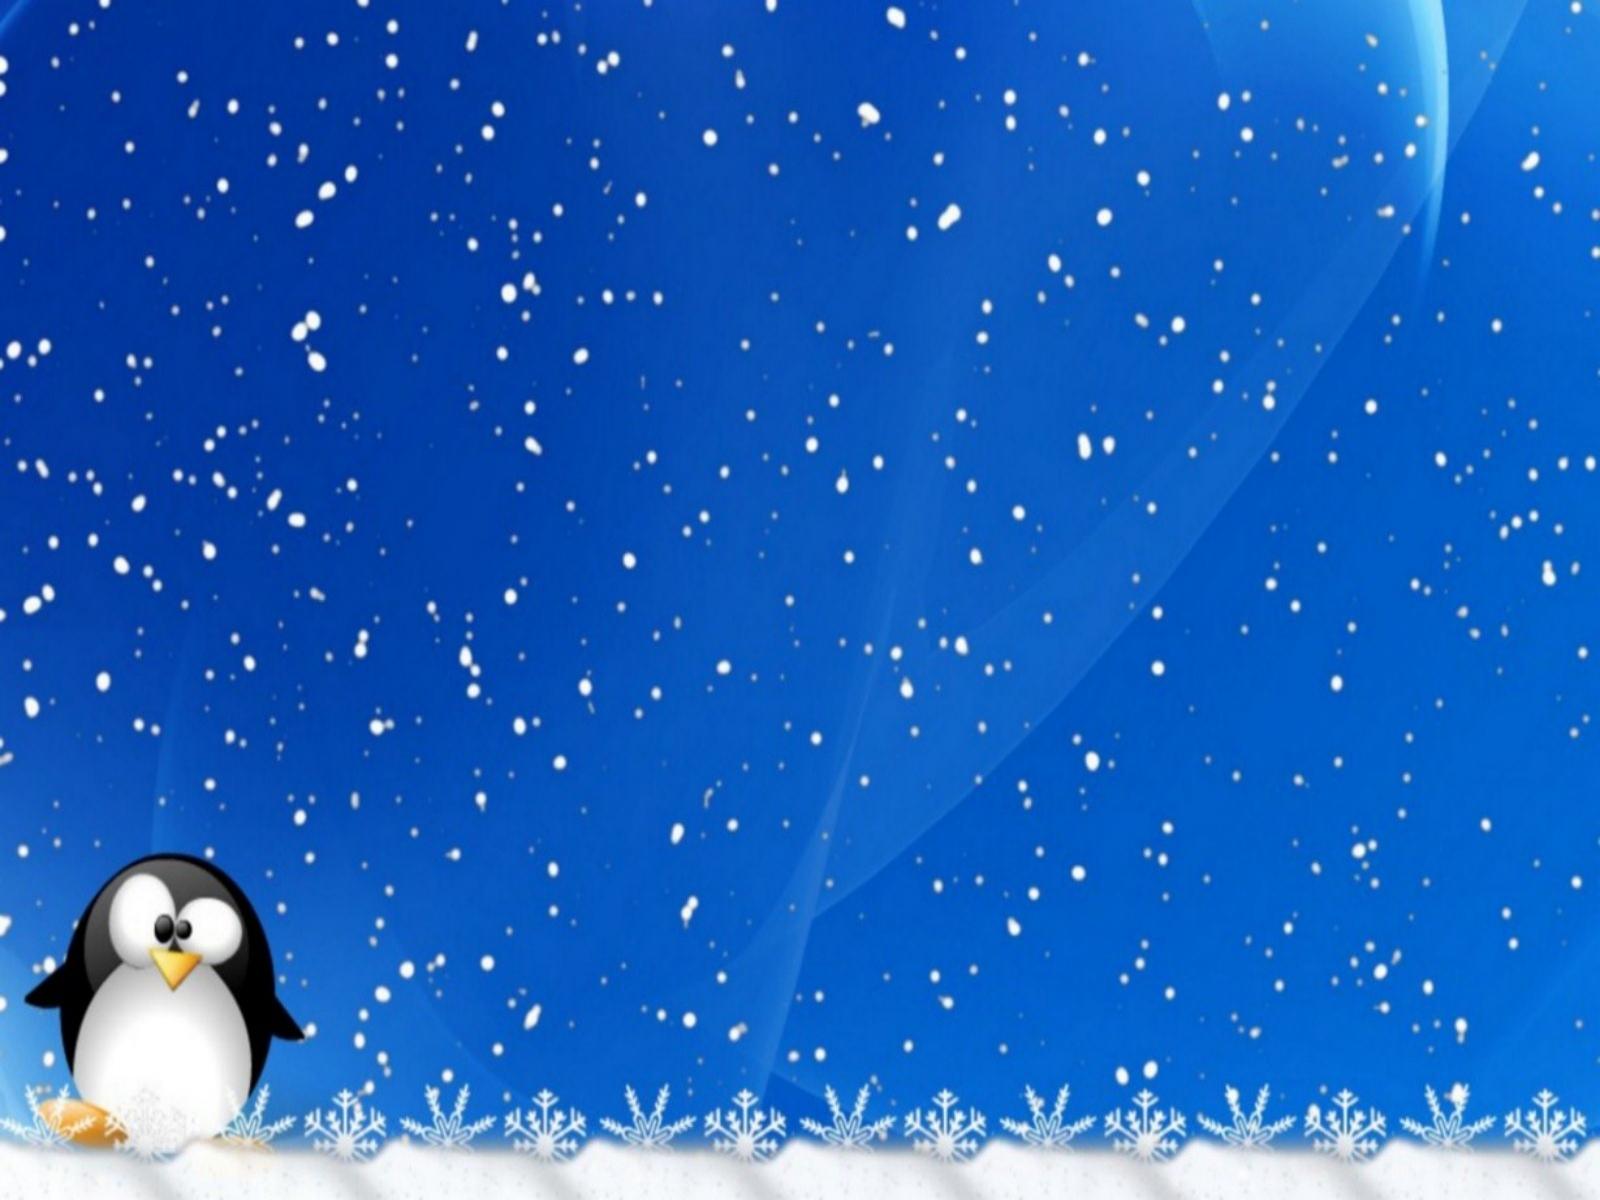 Winter Wallpaper Backgrounds 1600x1200